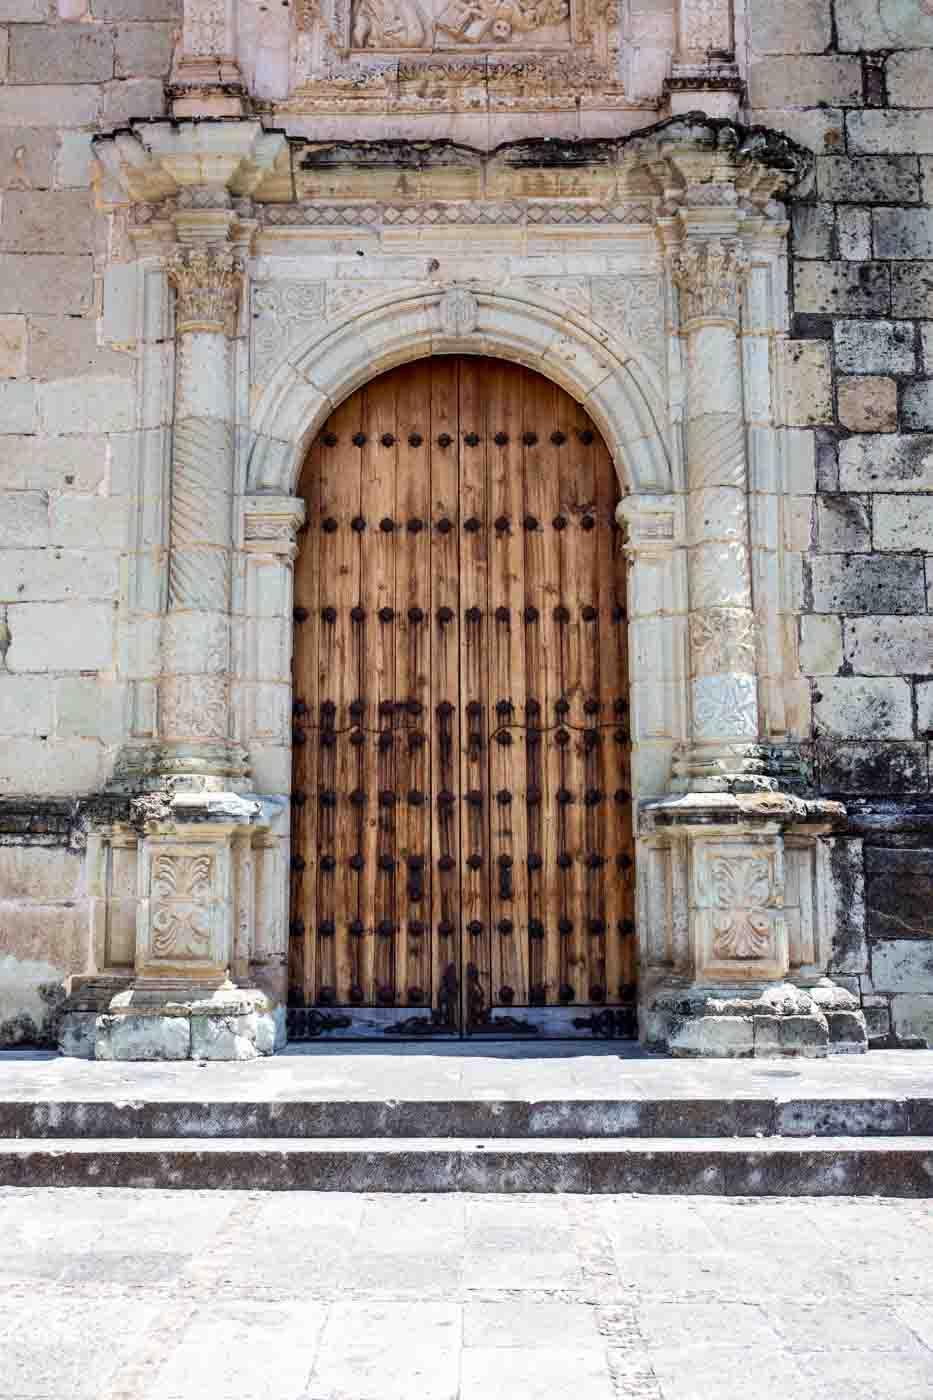 The Doors of Oaxaca